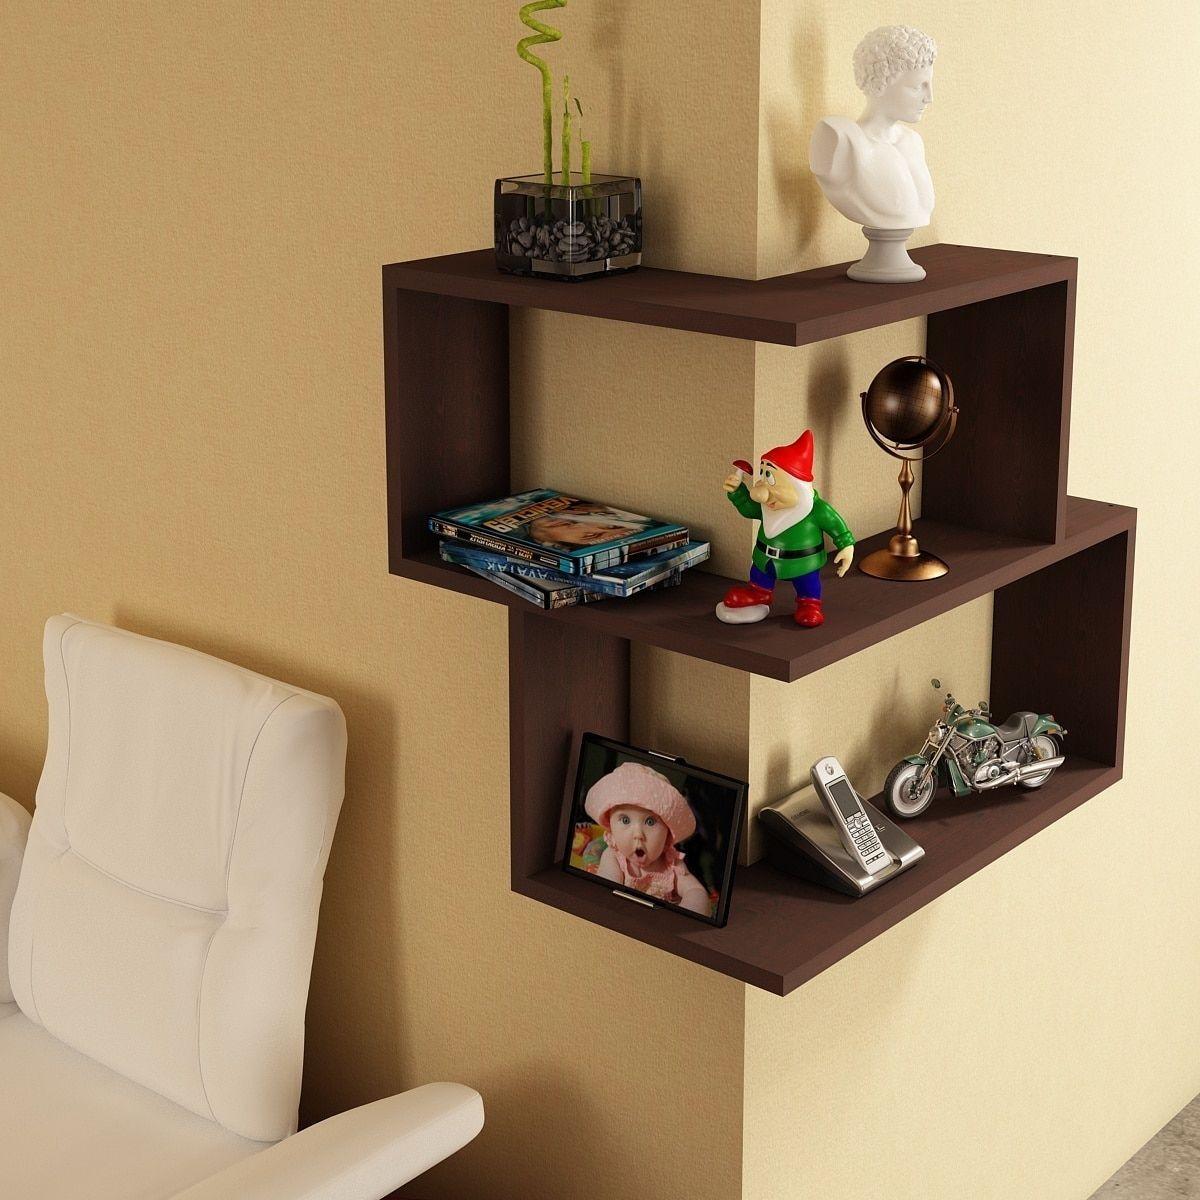 Overstock Com Online Shopping Bedding Furniture Electronics Jewelry Clothing More Corner Shelf Design Living Room Furniture Sale Shelf Design #wall #shelves #design #for #living #room